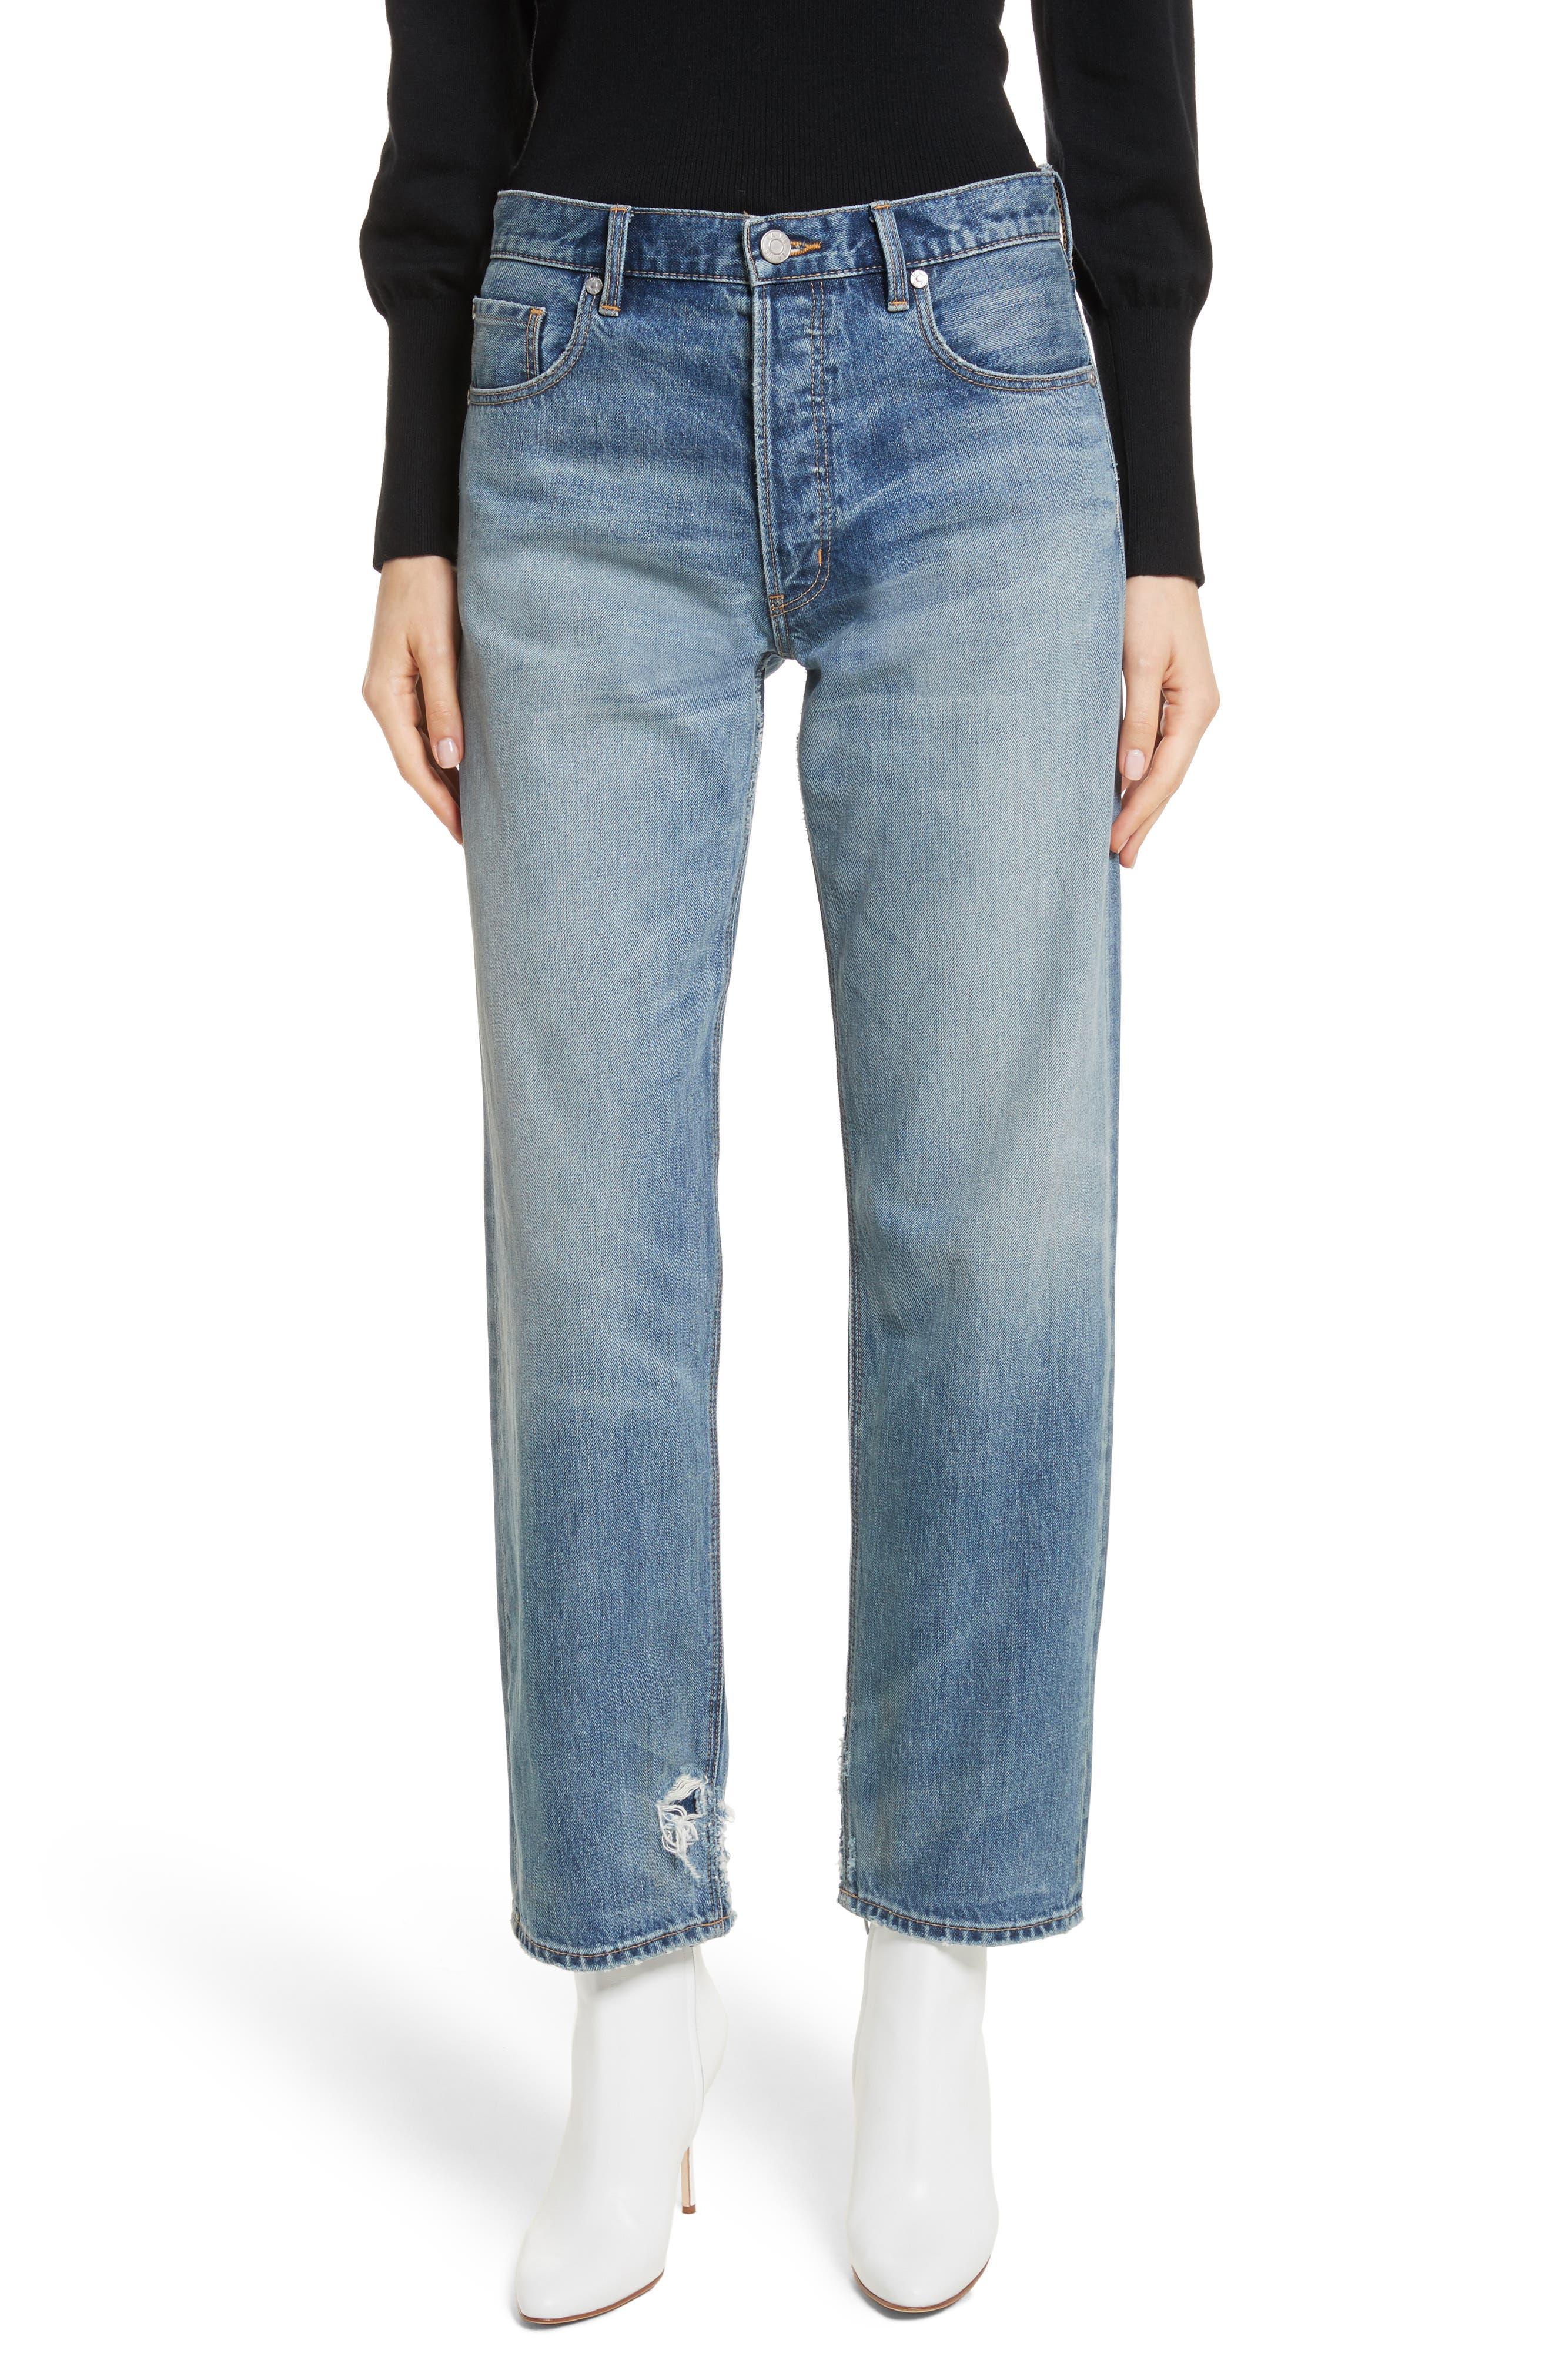 La Vie Rebecca Taylor Sylvie High Waist Straight Leg Ankle Jeans